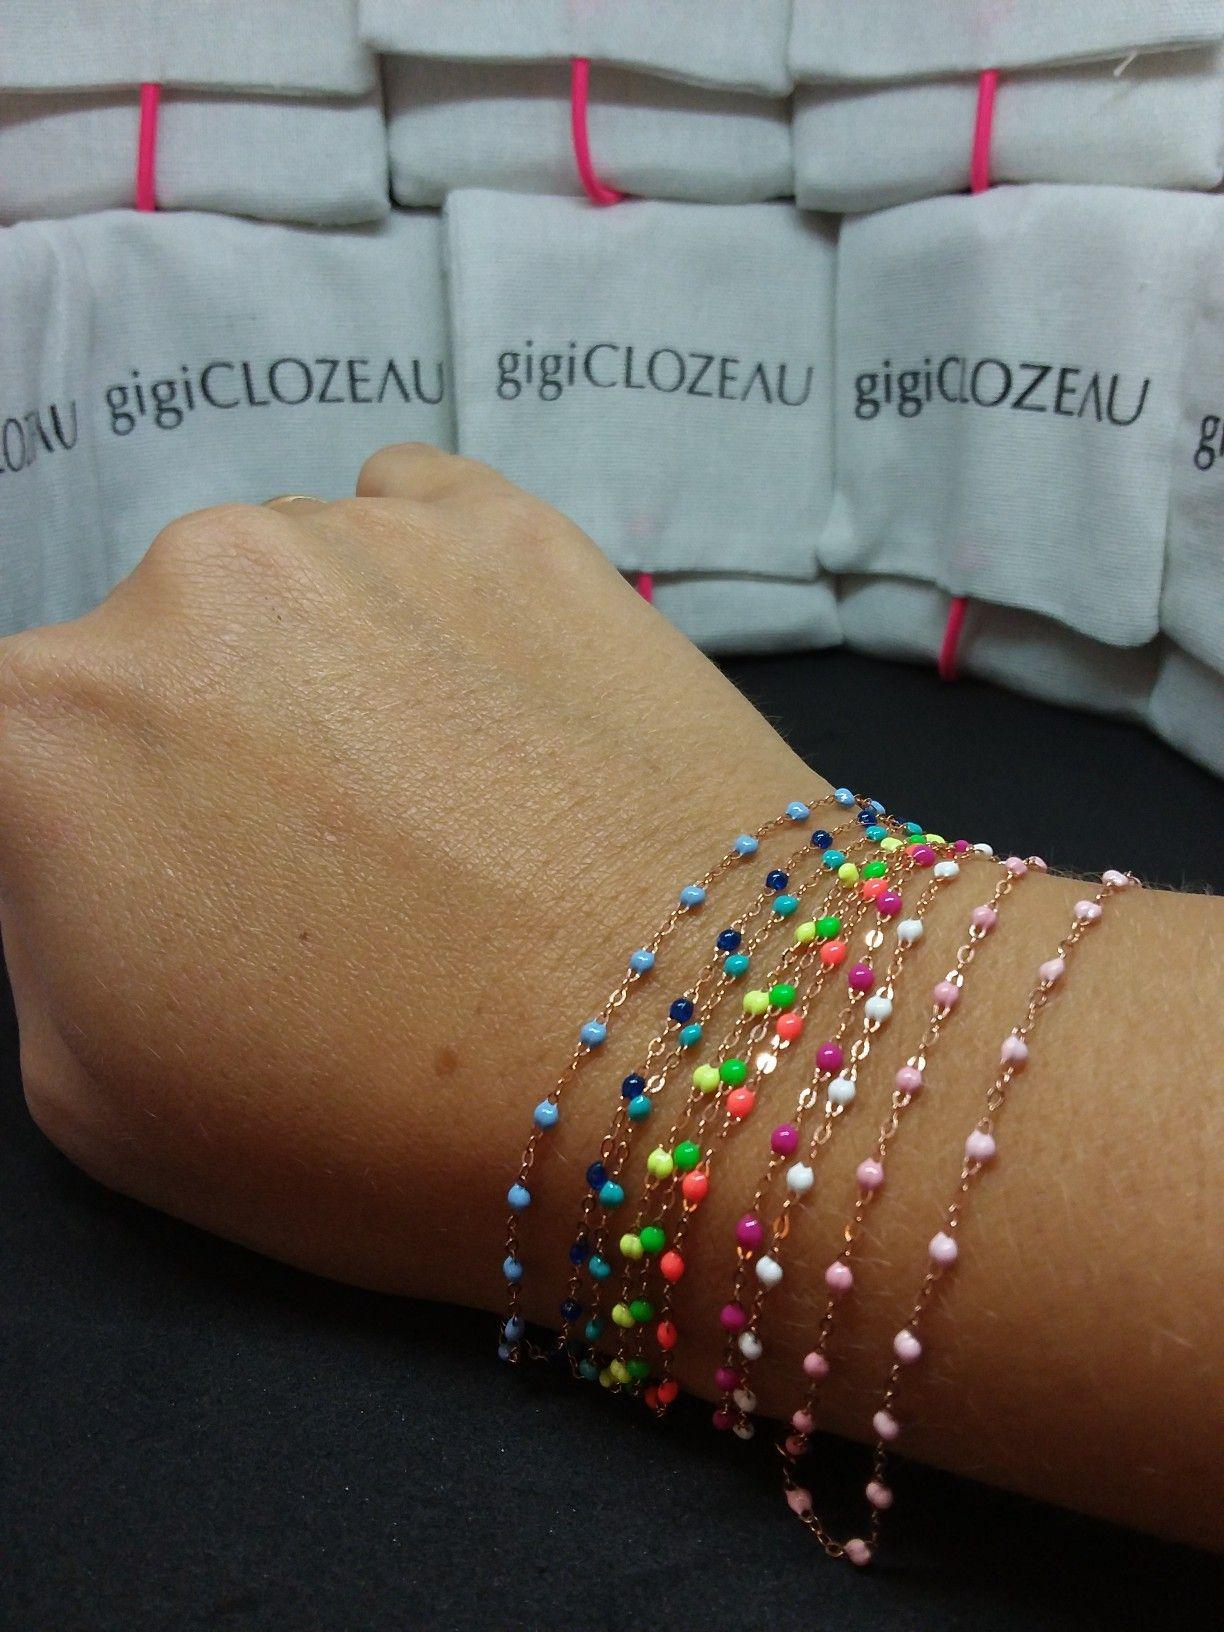 Razigran Pljeskati Olakšanje Bracelet Imitation Gigi Clozeau Herbandedi Org